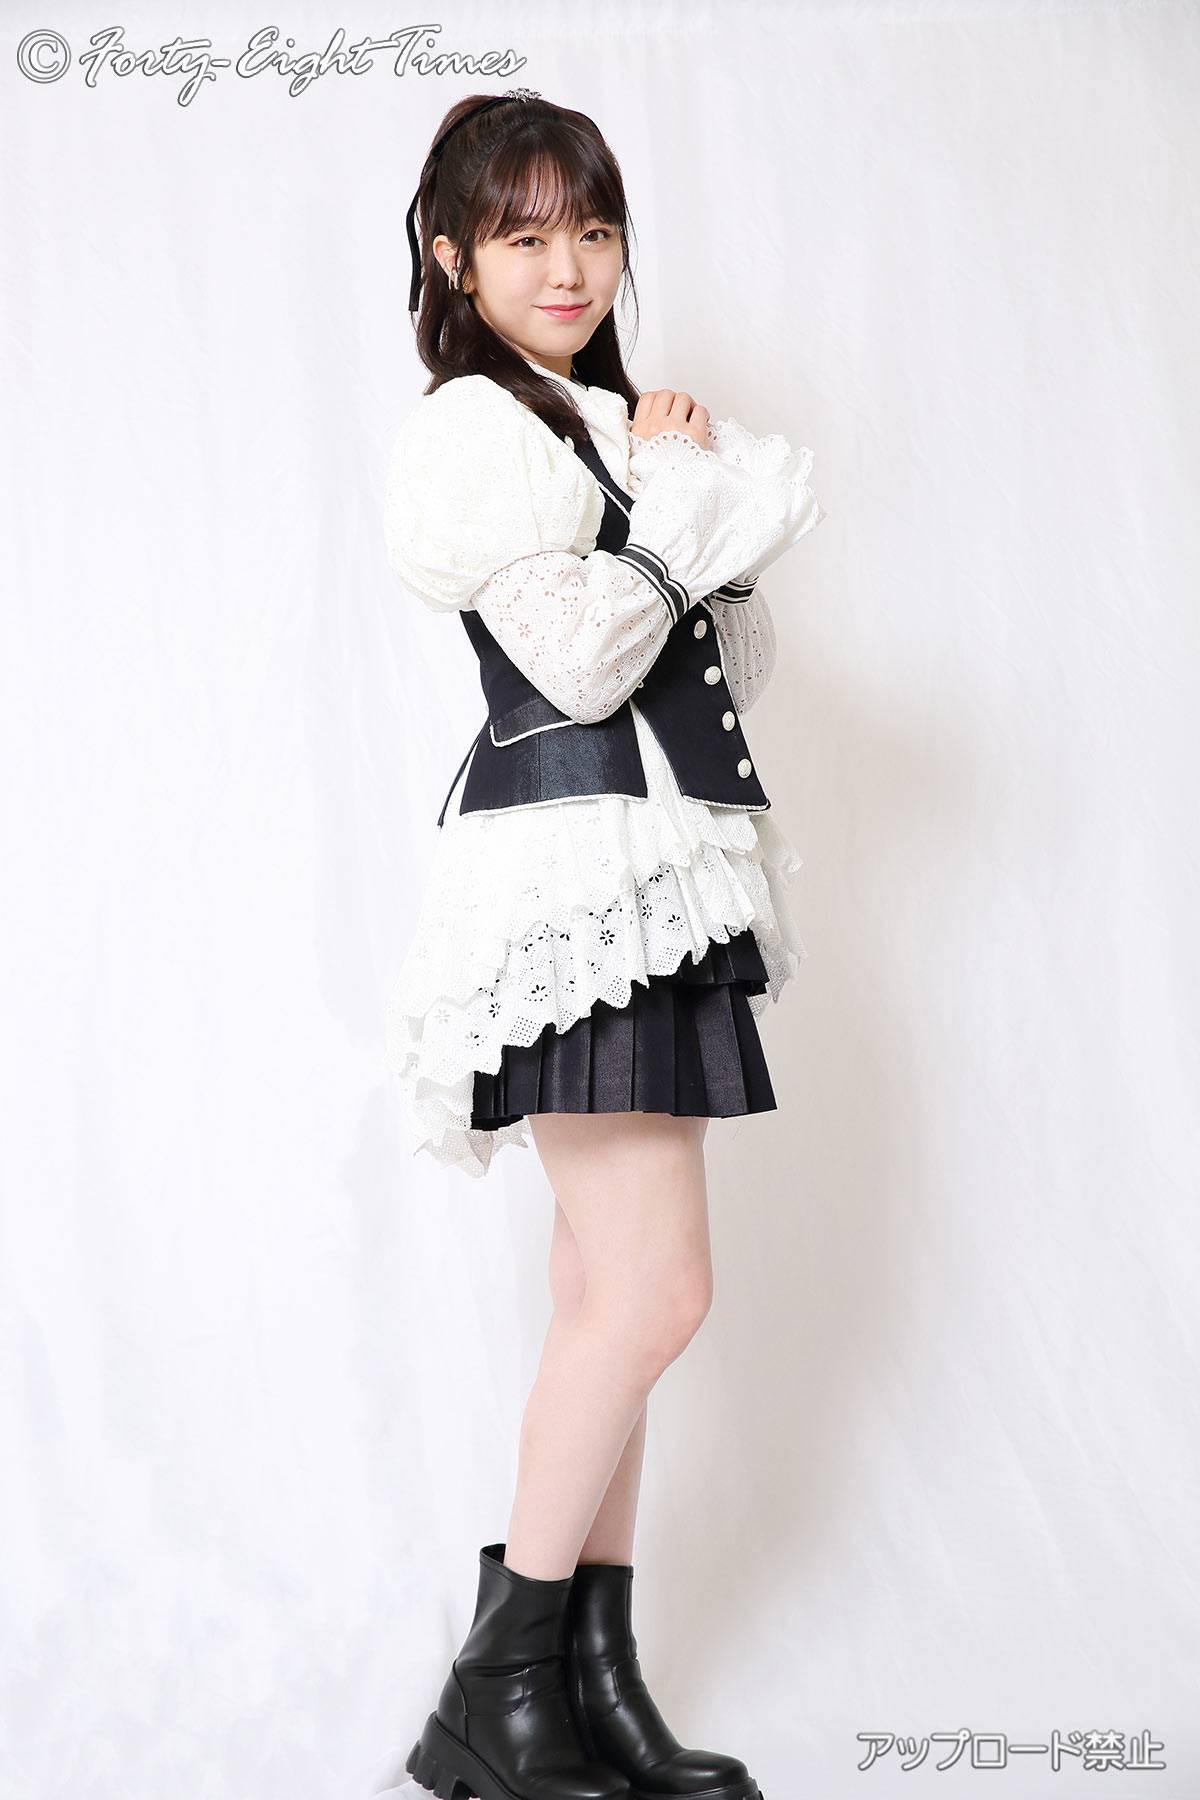 Minegishi Minami 48 Times 2105 05.jpg